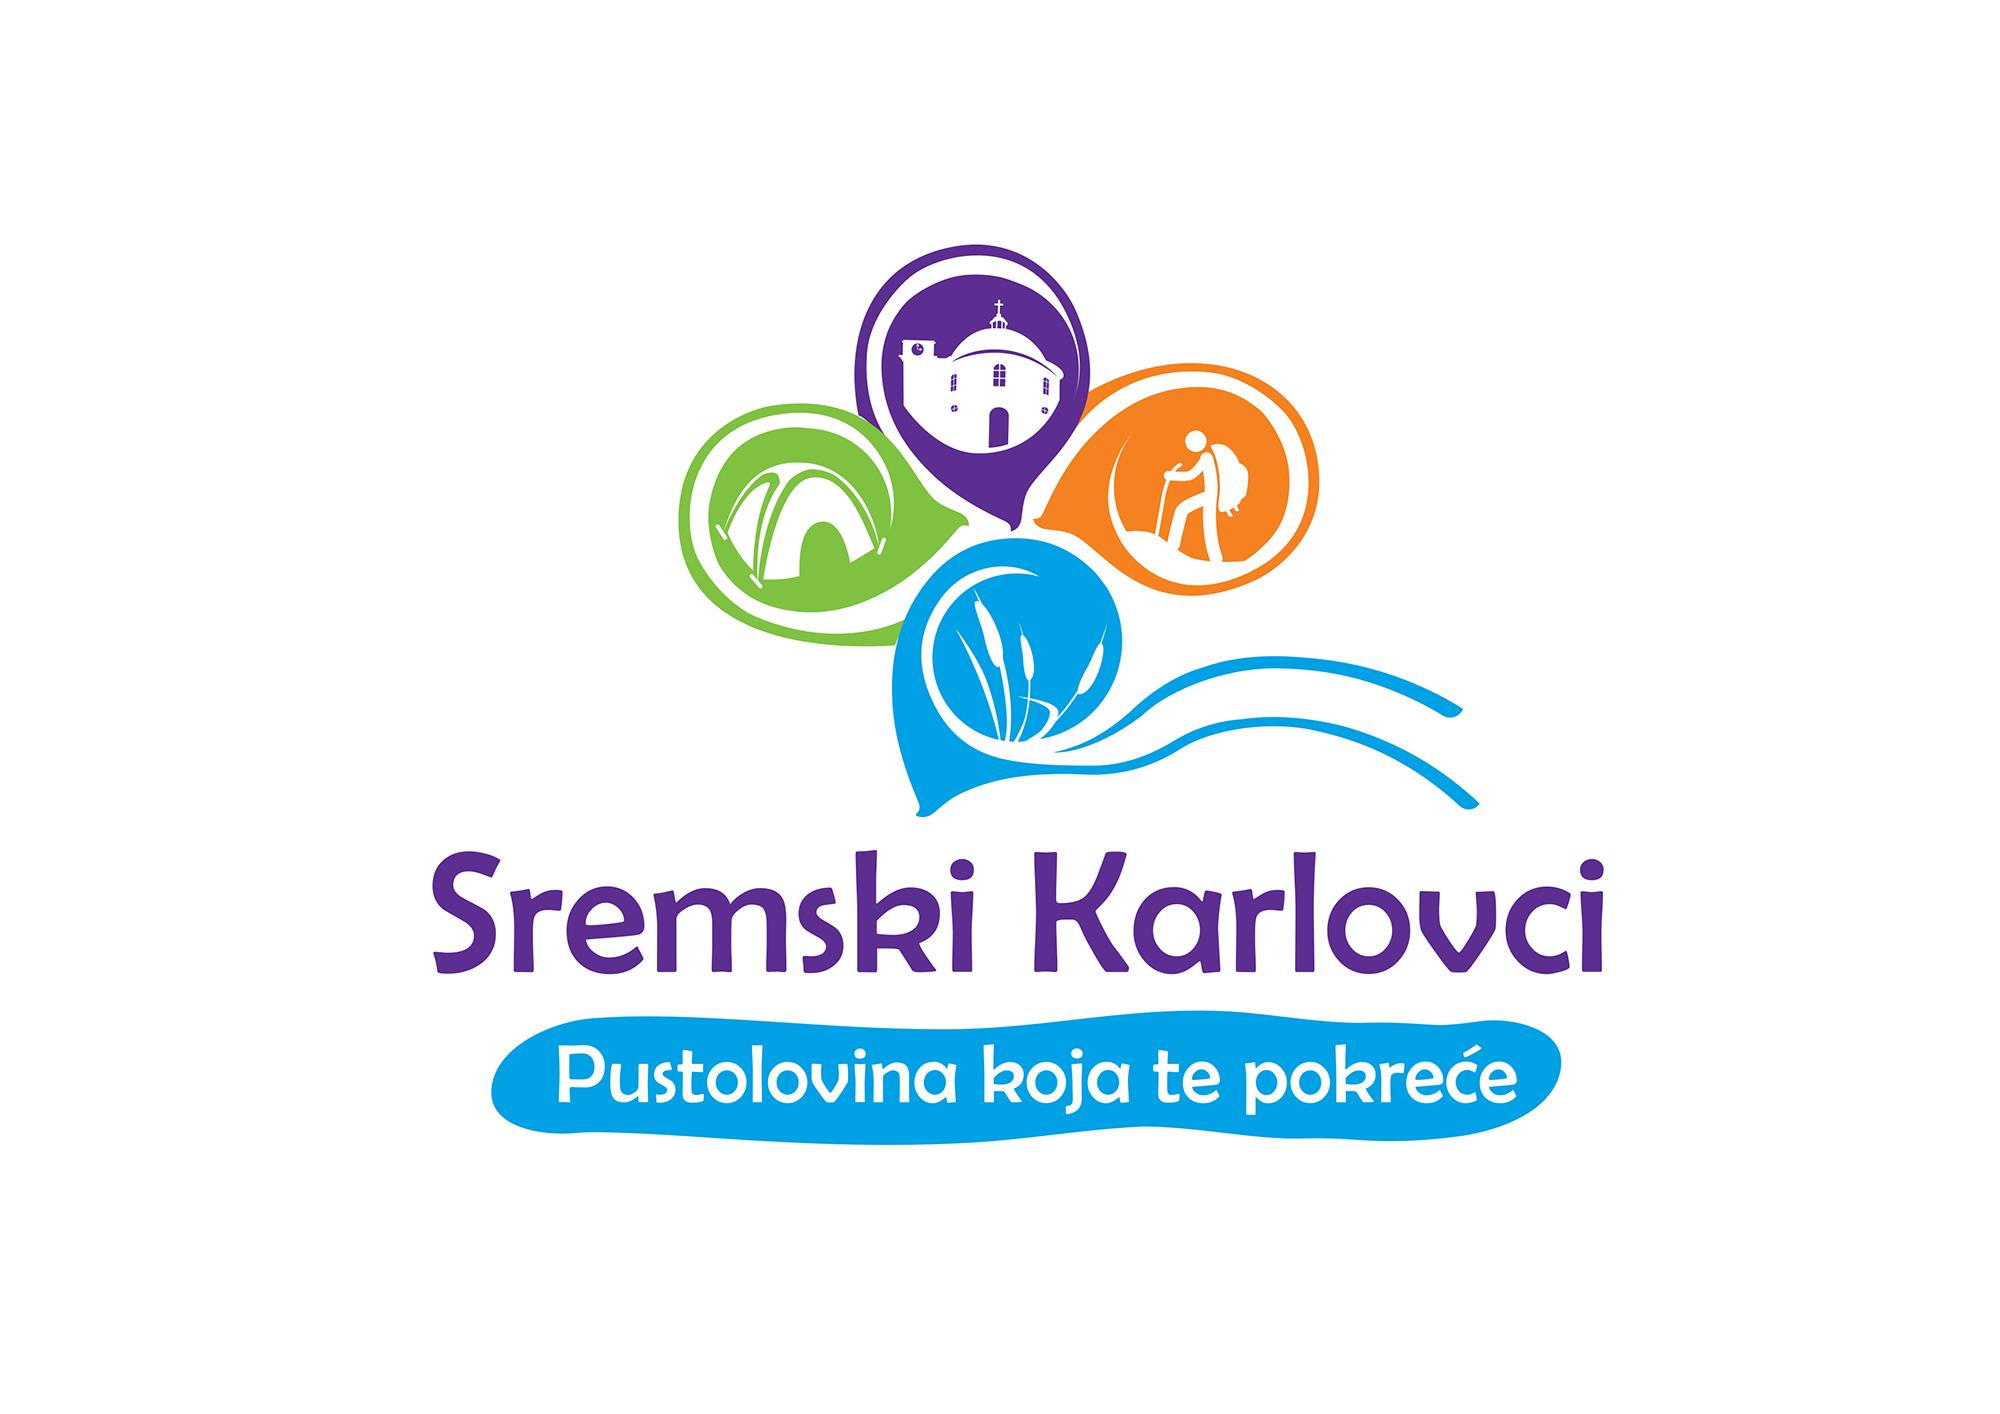 Zastitni-znak-Sremski-Karlovci-EKO-destinacija.jpg